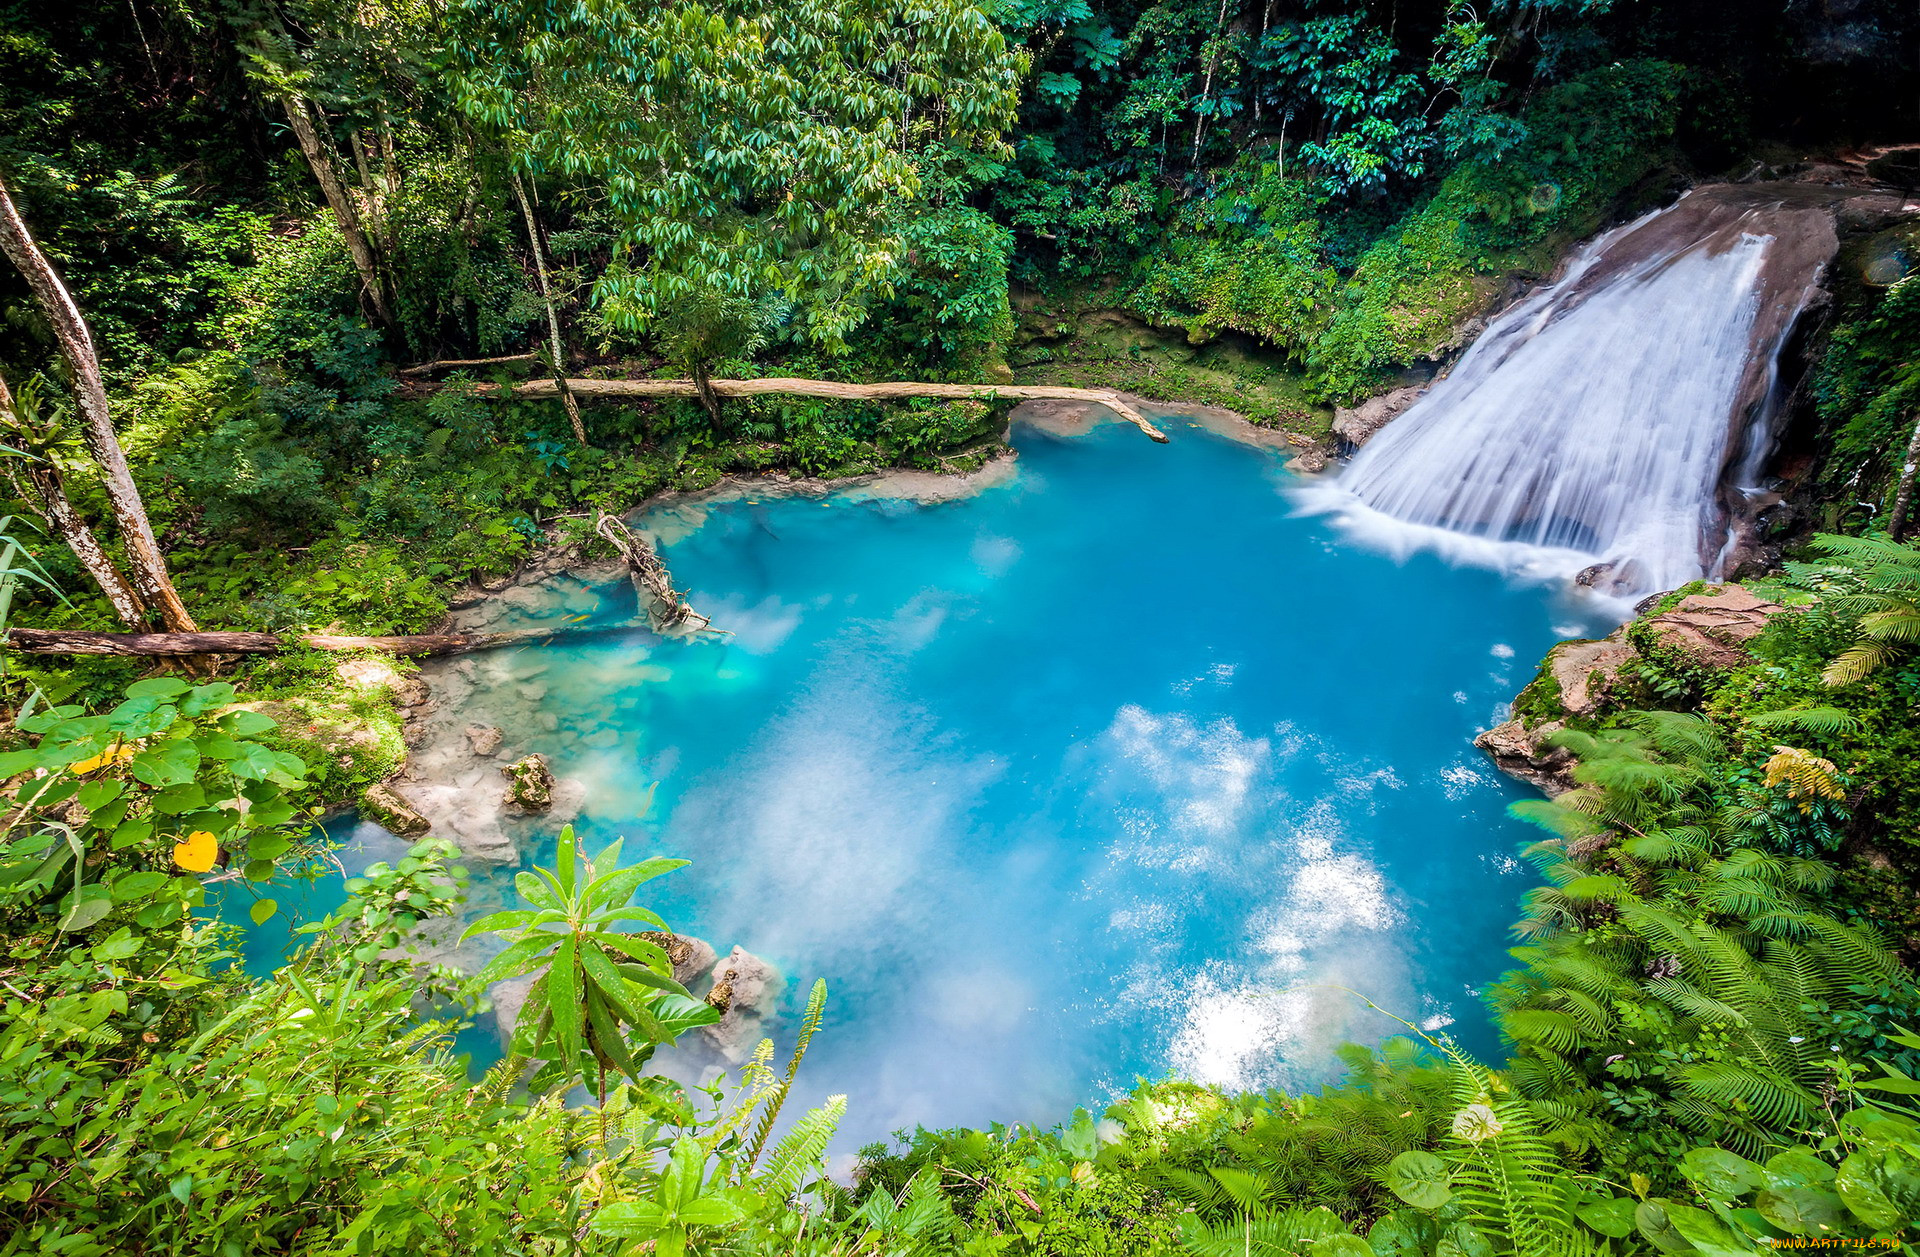 the blue hole in ocho rios,  jamaica, природа, водопады, the, blue, hole, in, ocho, rios, jamaica